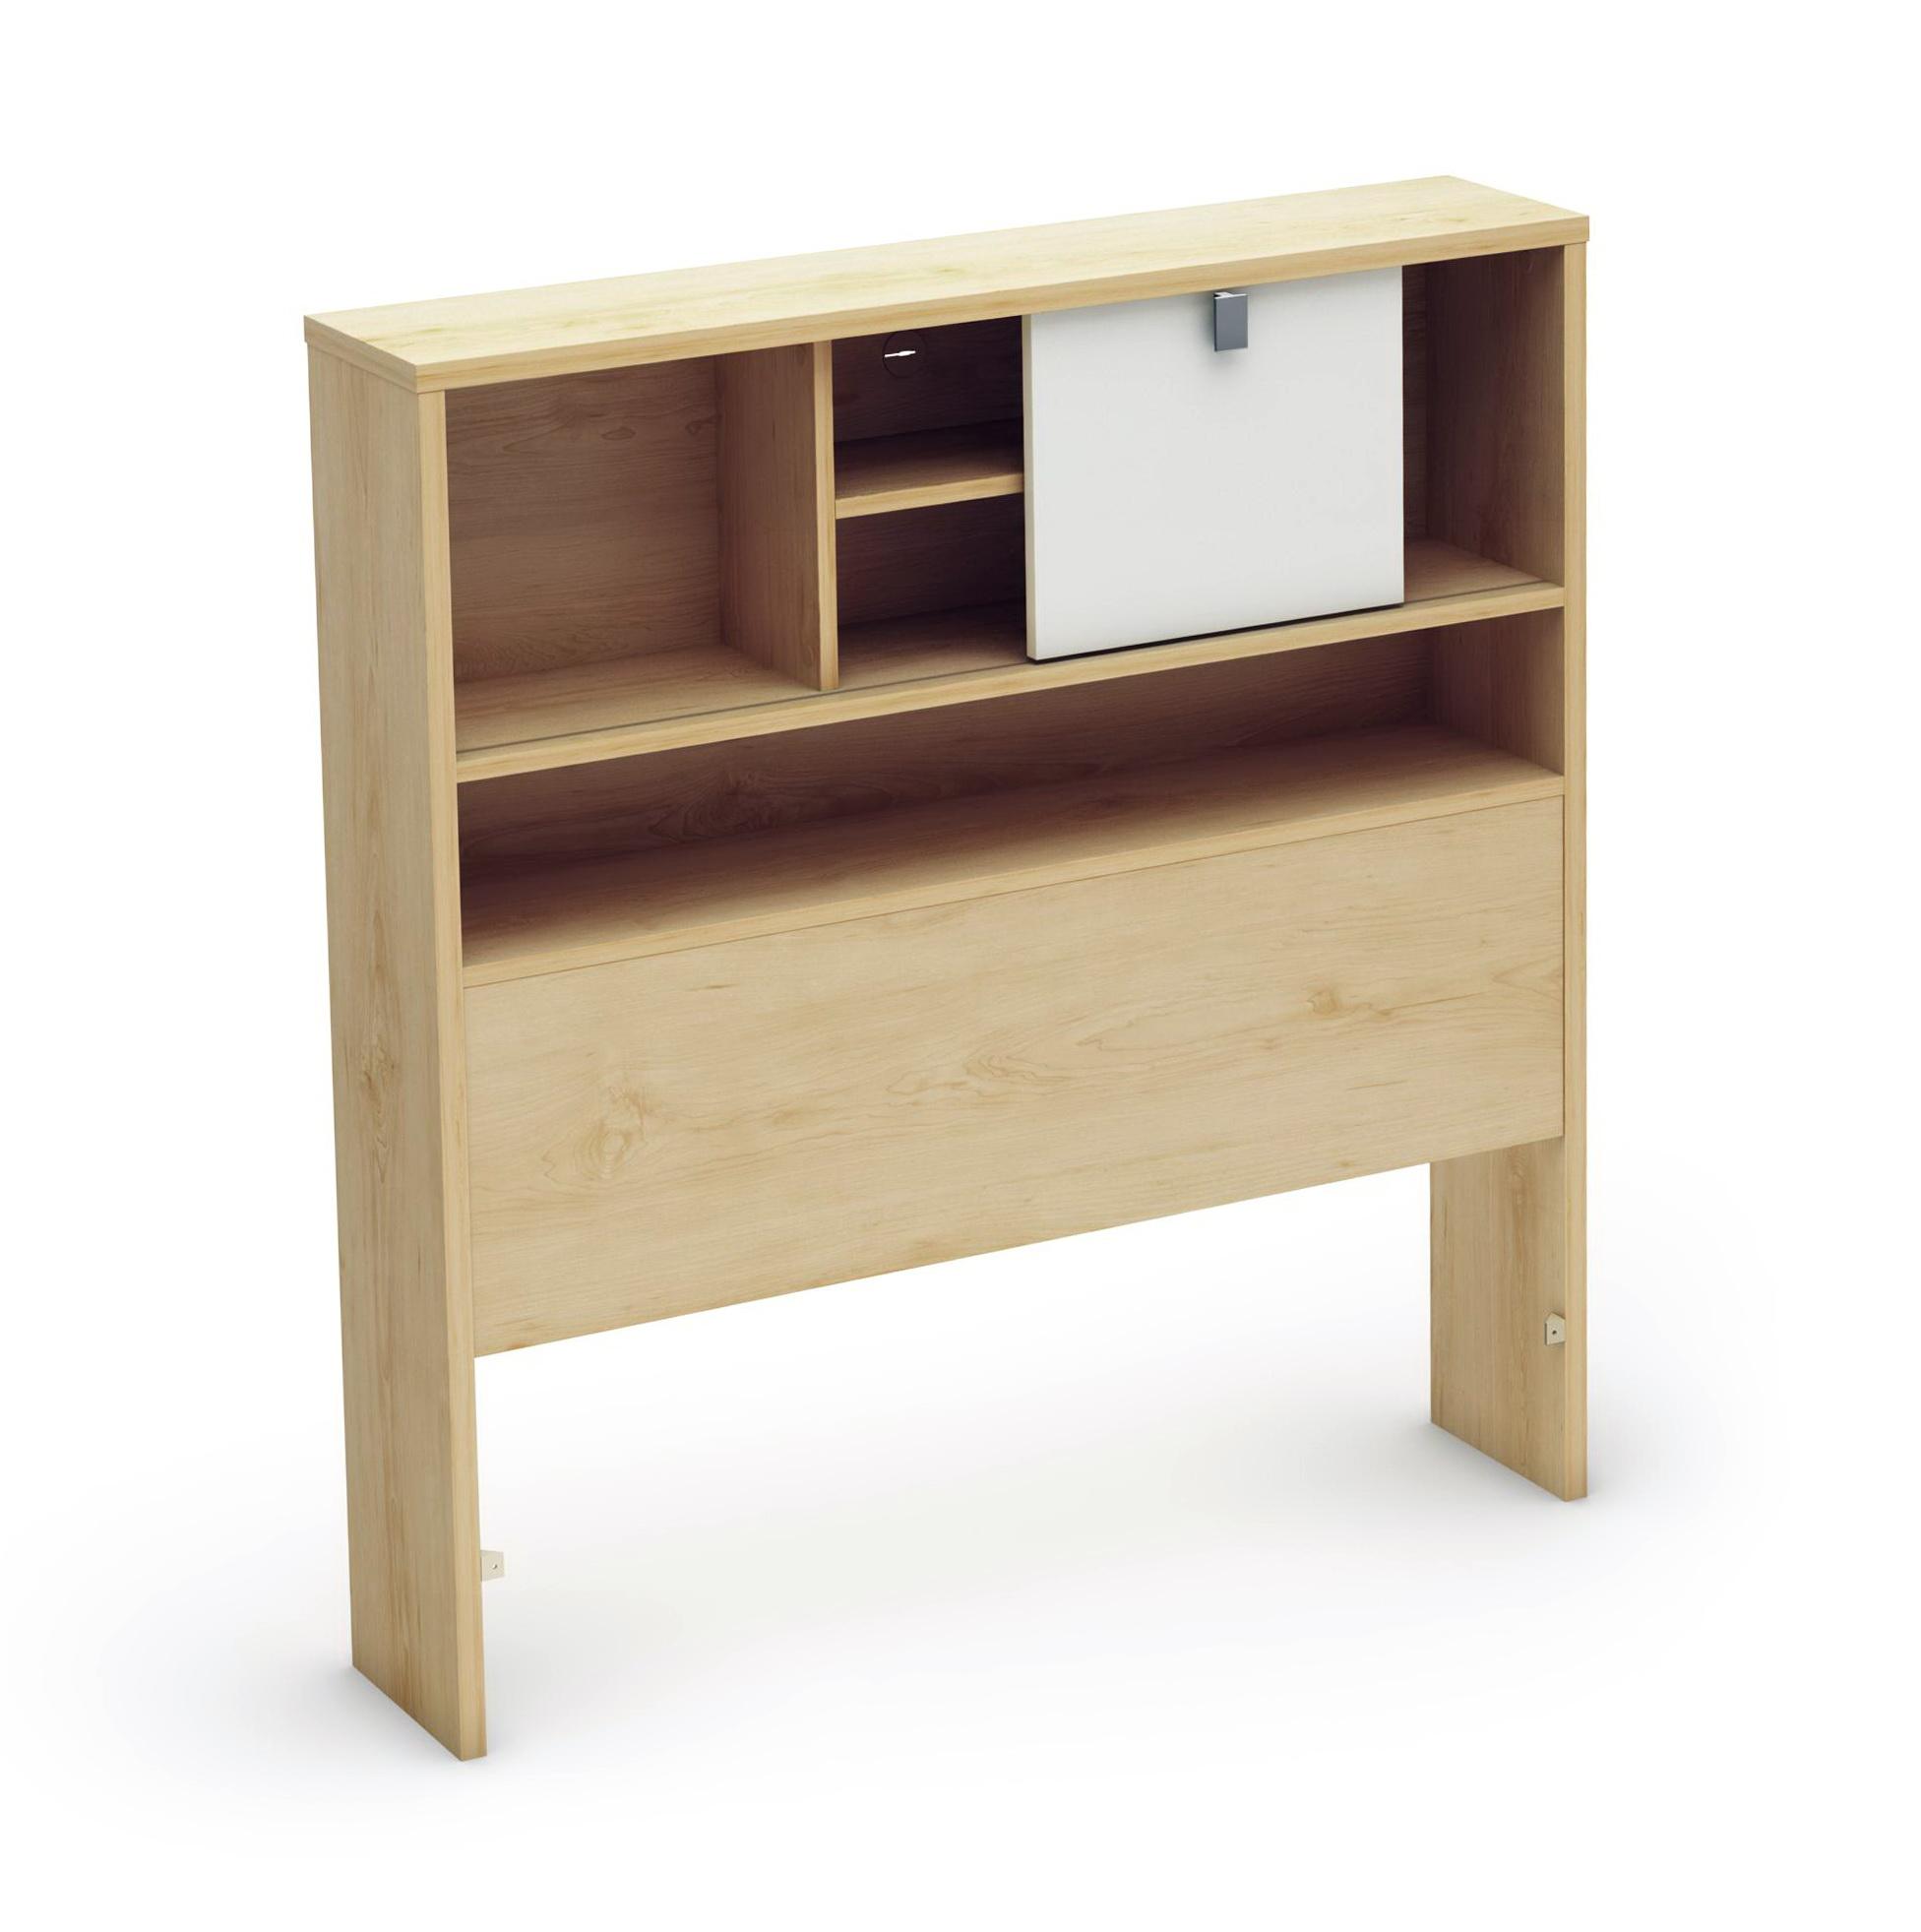 Twin Headboard And Dresser